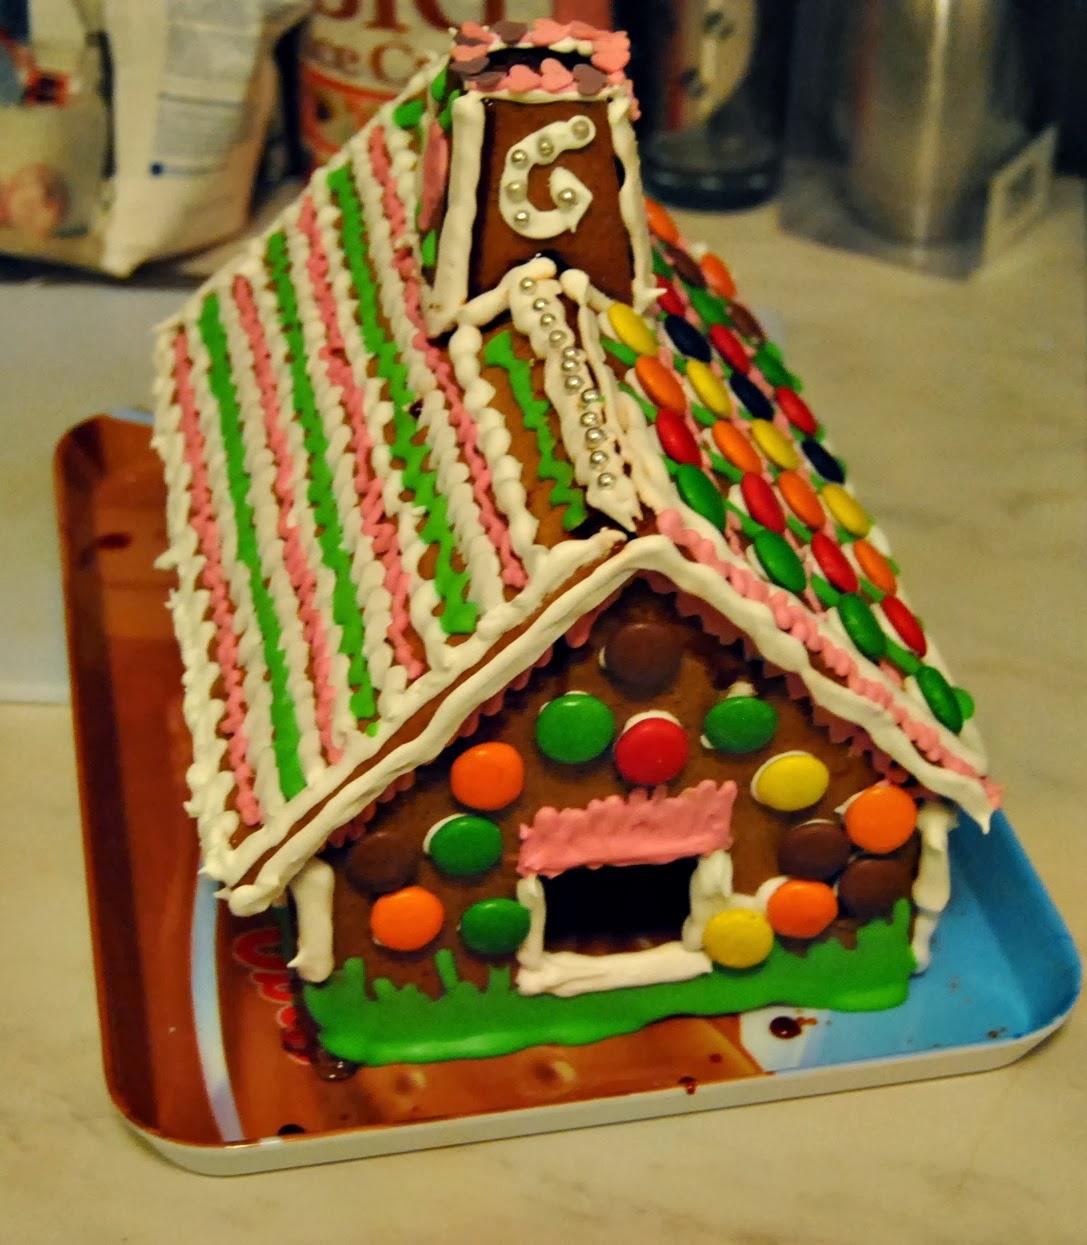 Christmas Gingerbread House Decoration Ideas & CupcakeLovers: Christmas Gingerbread House Decoration Ideas